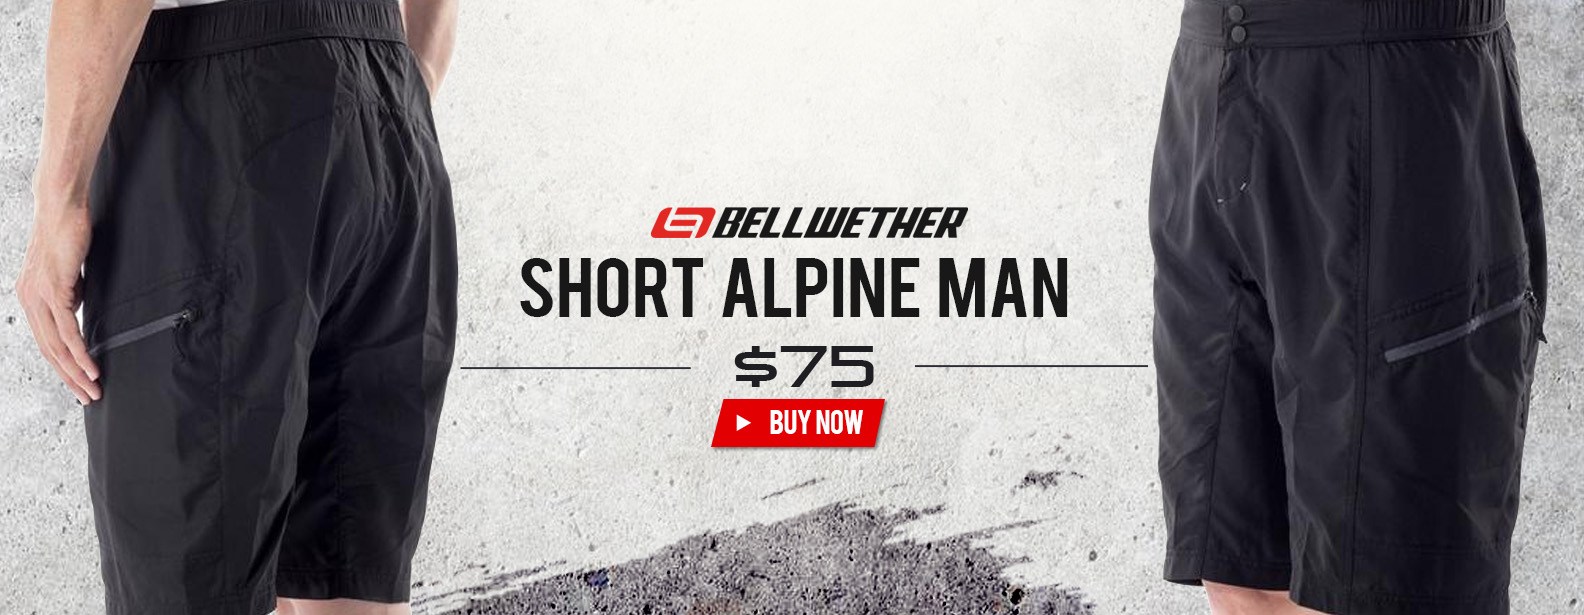 Bellwether Alpine Man Short